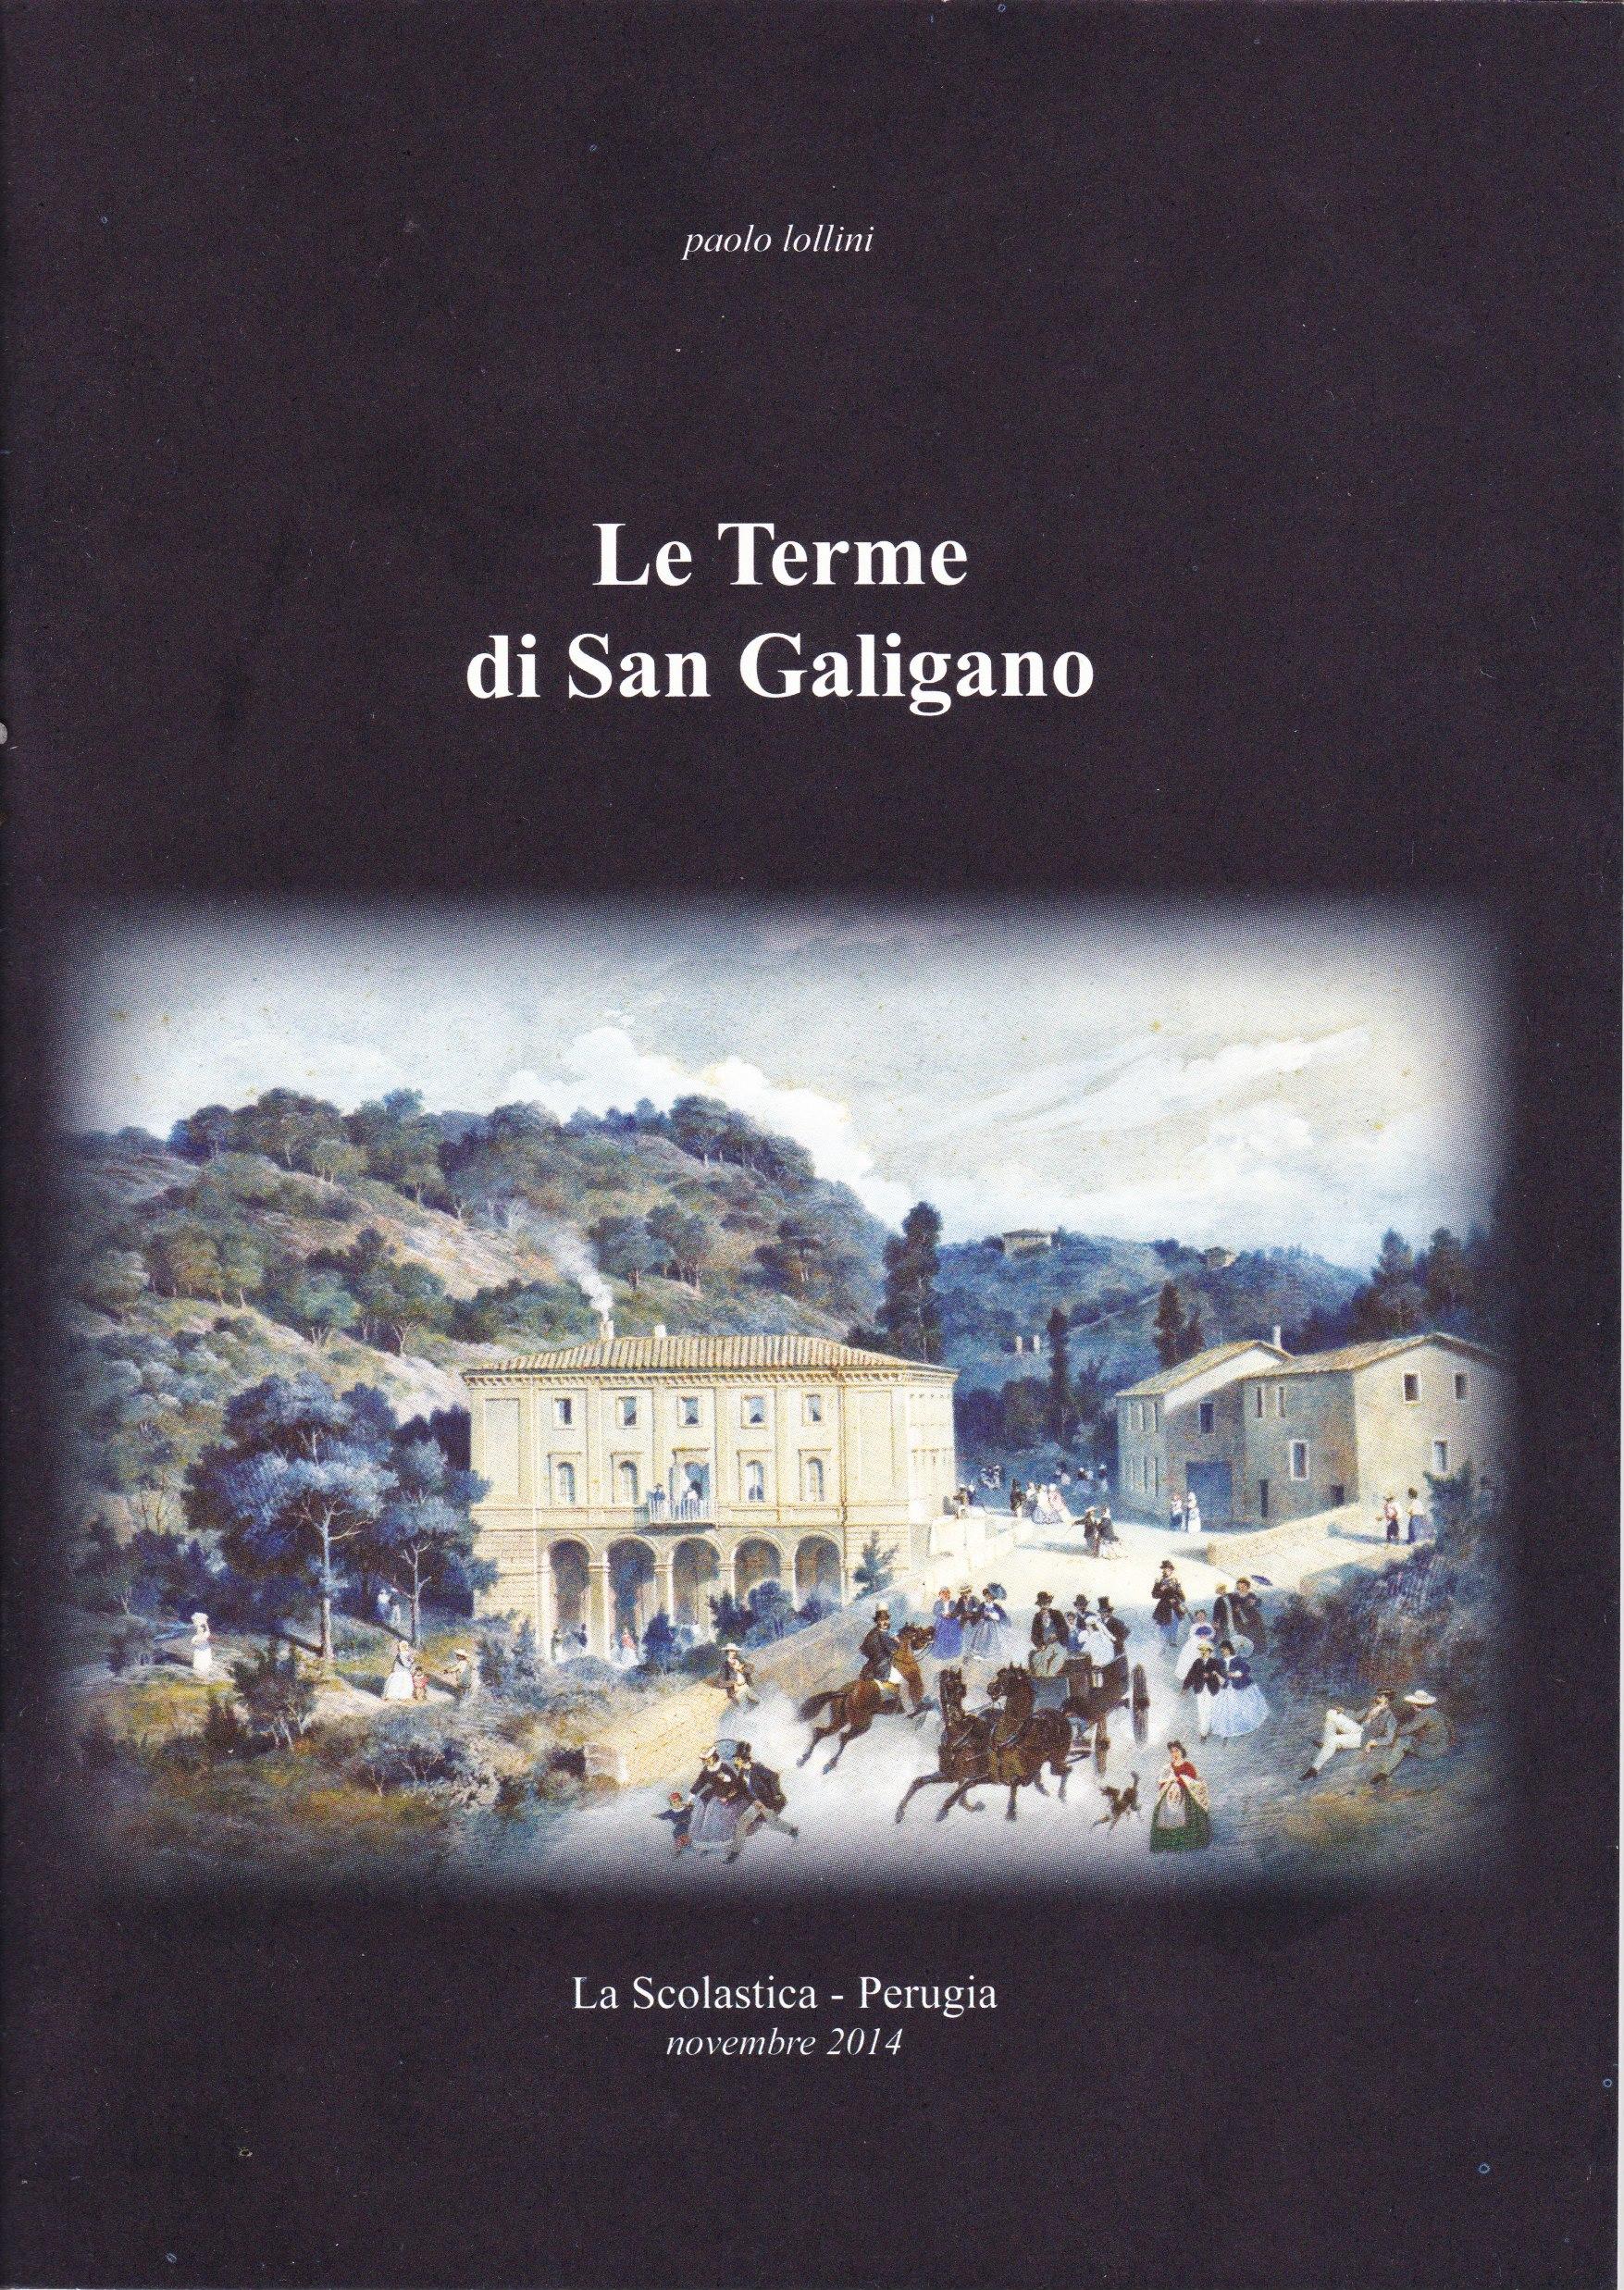 Le terme di San Galigano